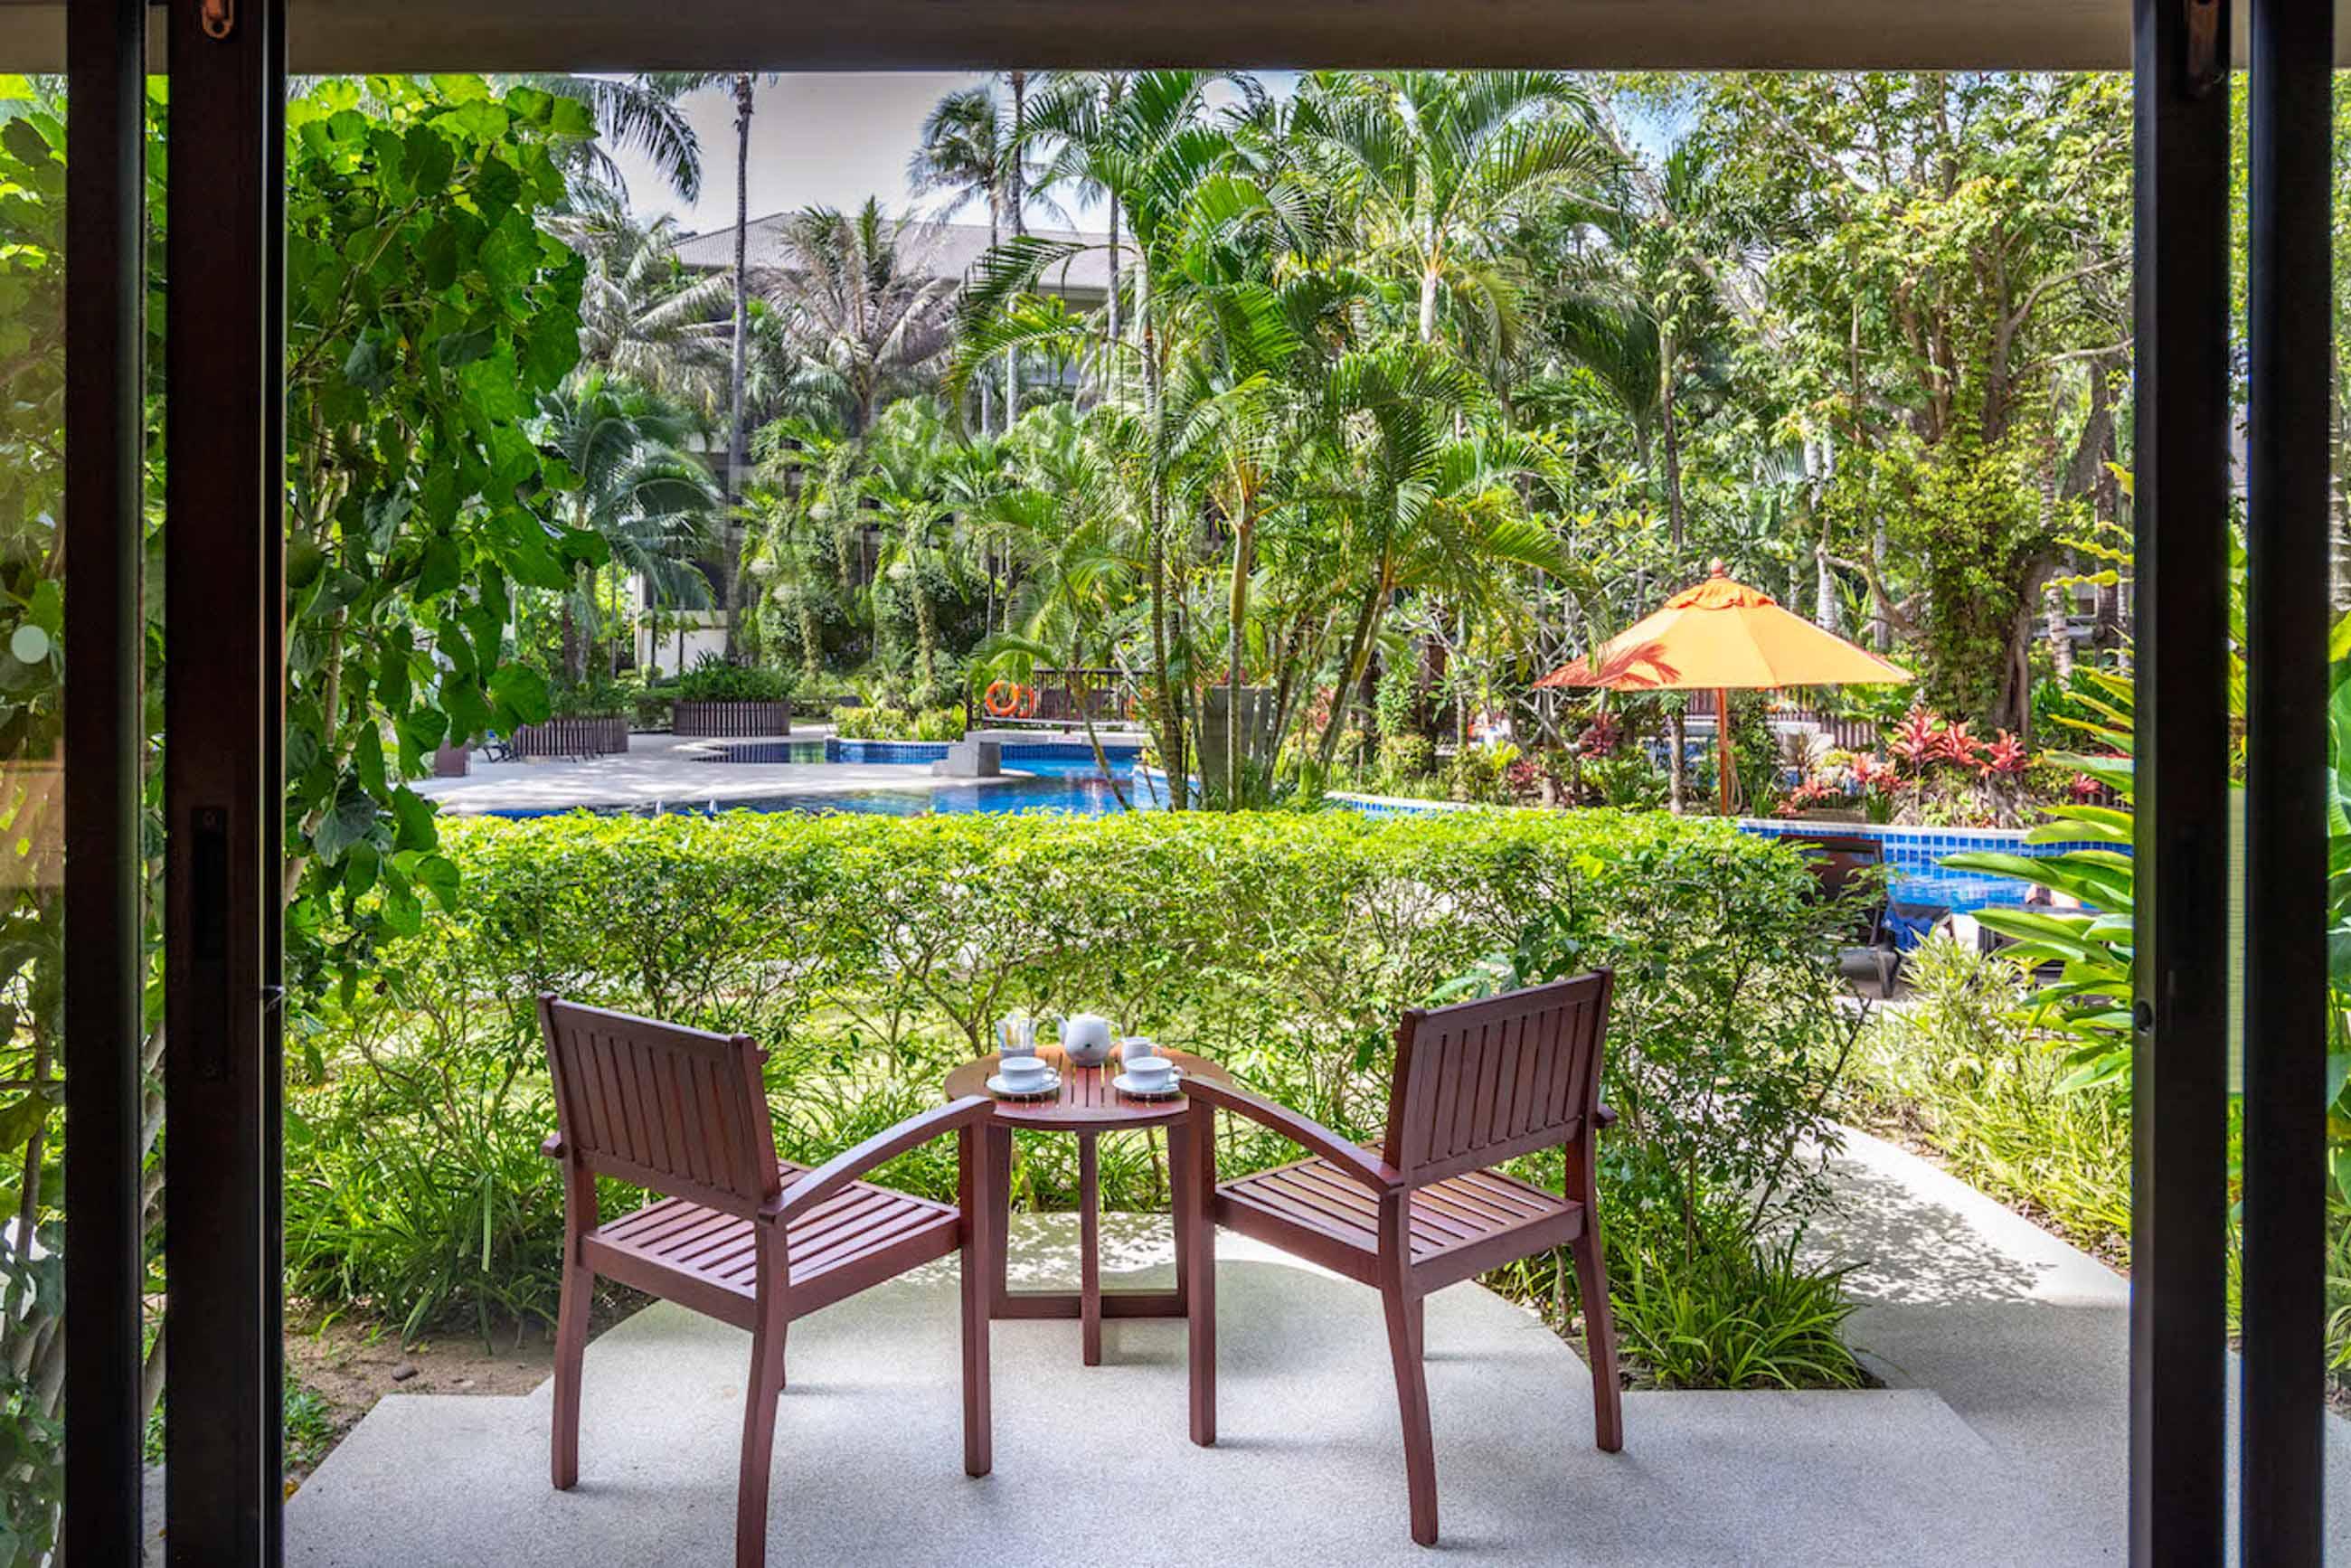 https://bubo.sk/uploads/galleries/7404/novotel-phuket-surin-beach-resort-terrace-pool-access.jpg